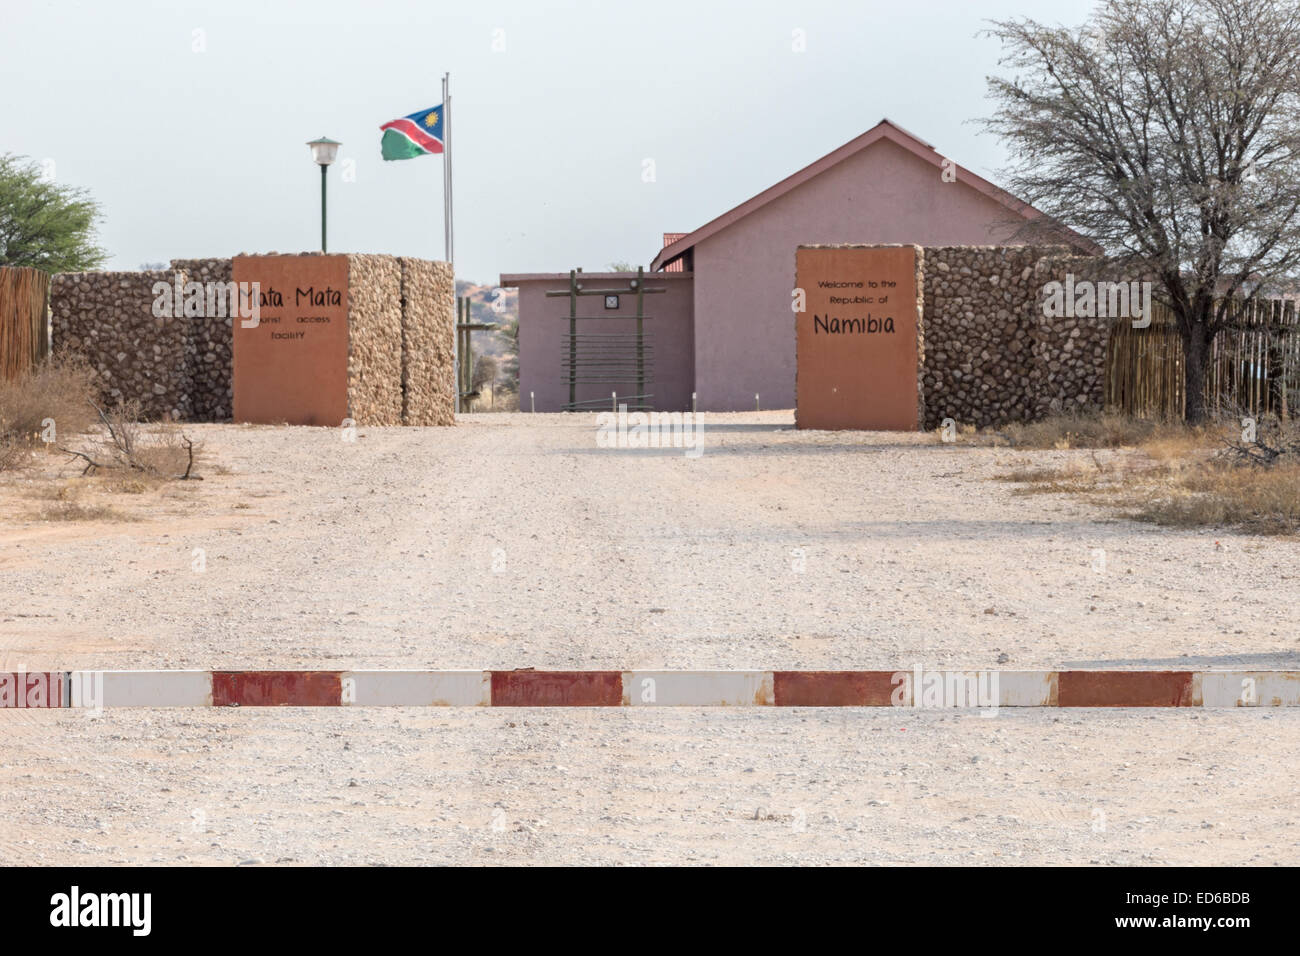 South African namibian border Mata-Mata Kgalagadi Transfrontier Park South Africa - Stock Image